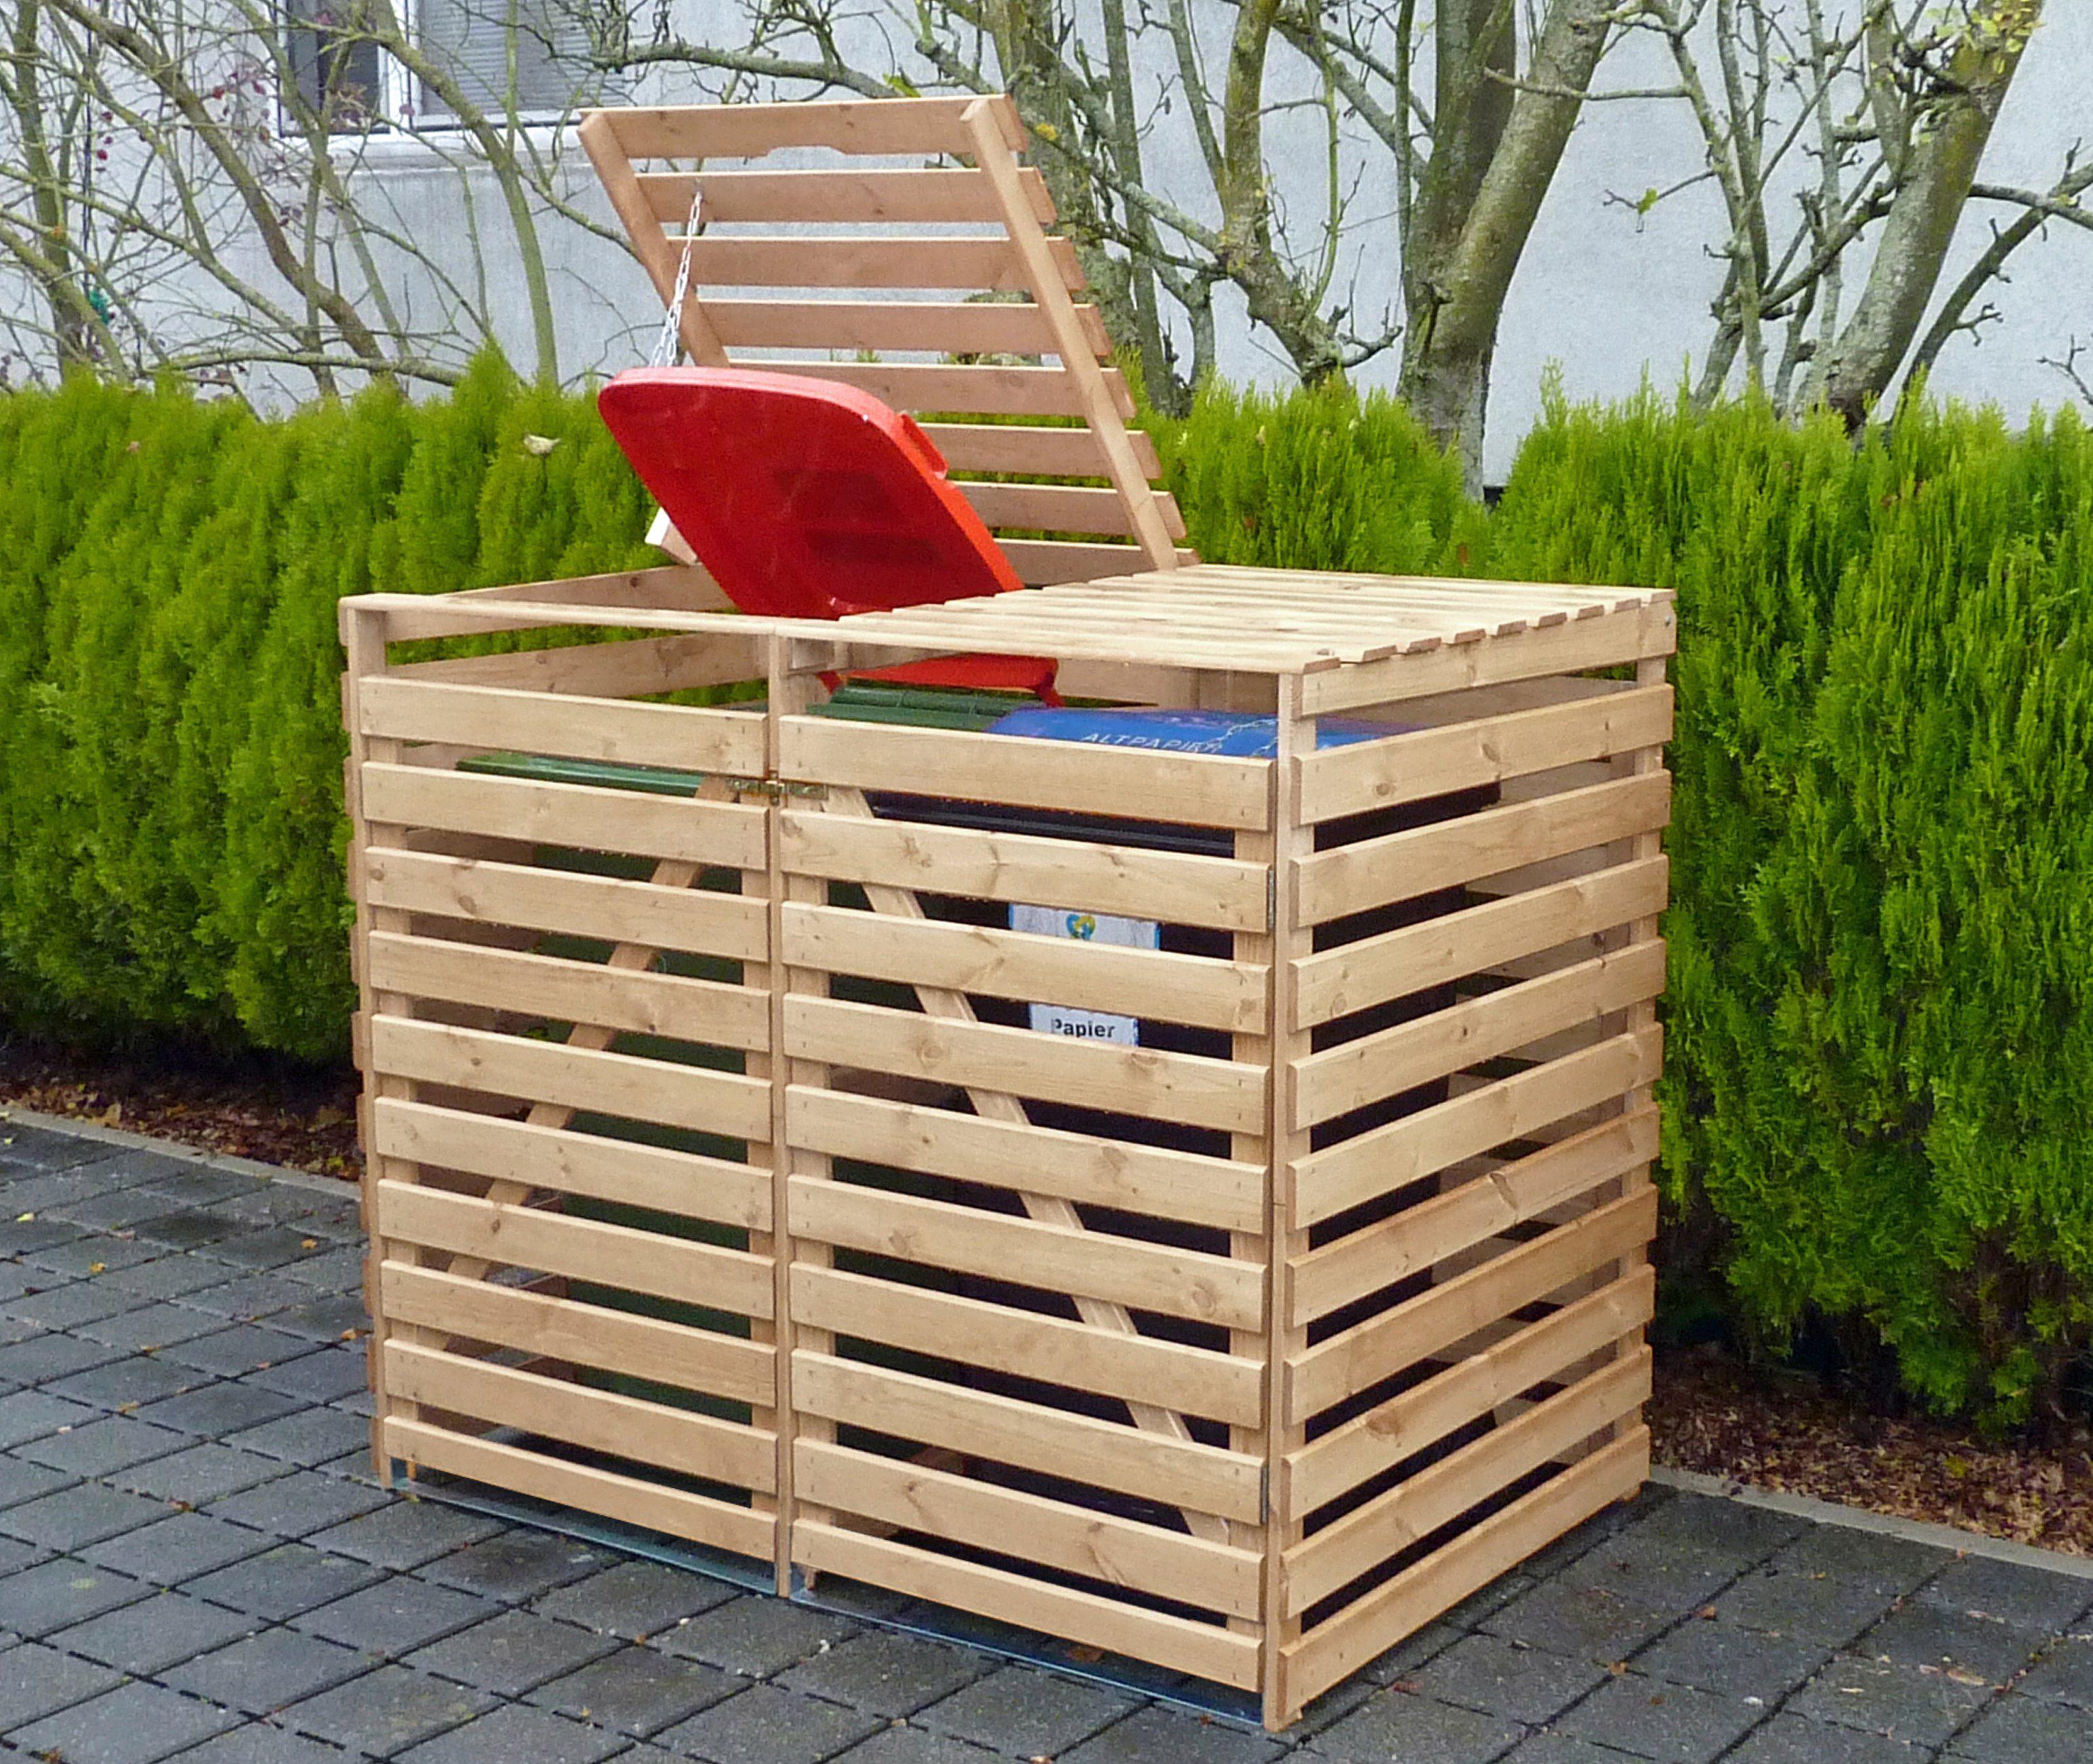 PROMADINO Mülltonnenbox »Vario V«, für 2 x 240 l, holzfarben